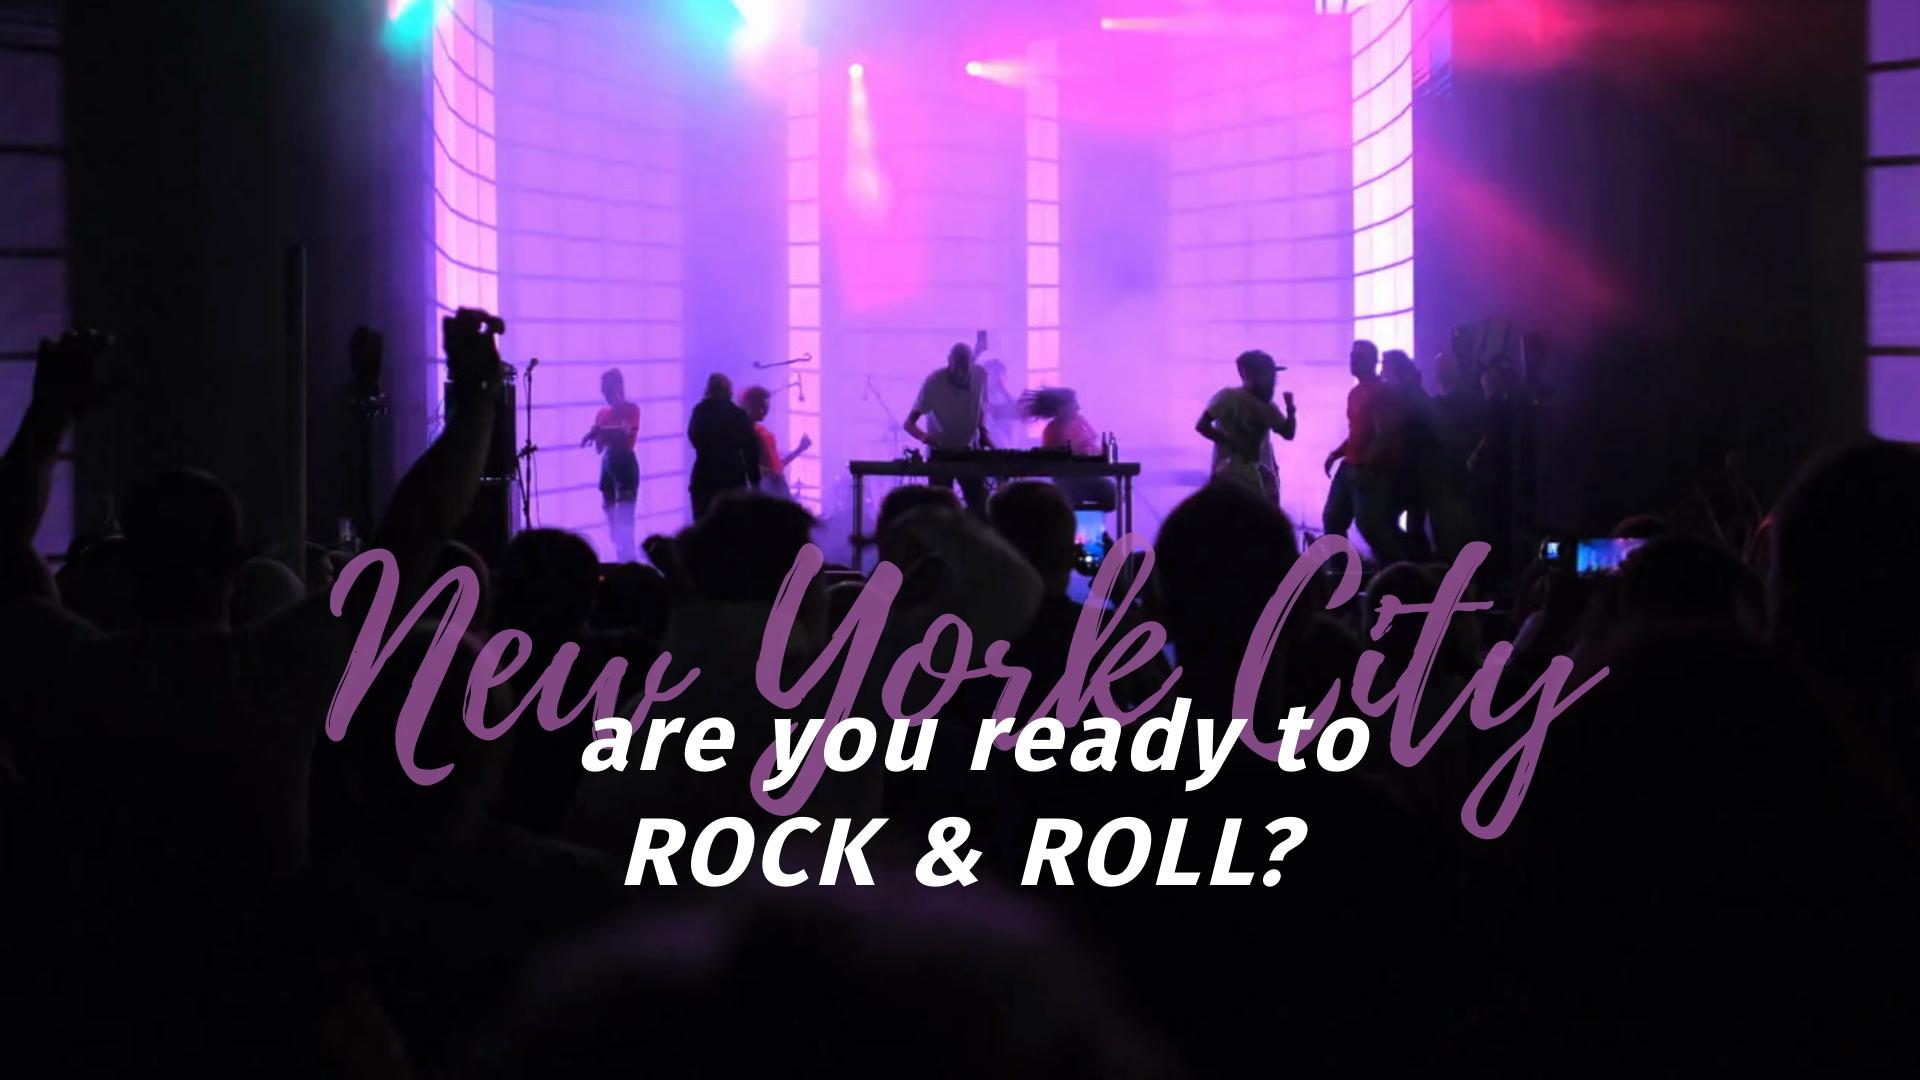 Concert Trailer - Video Template